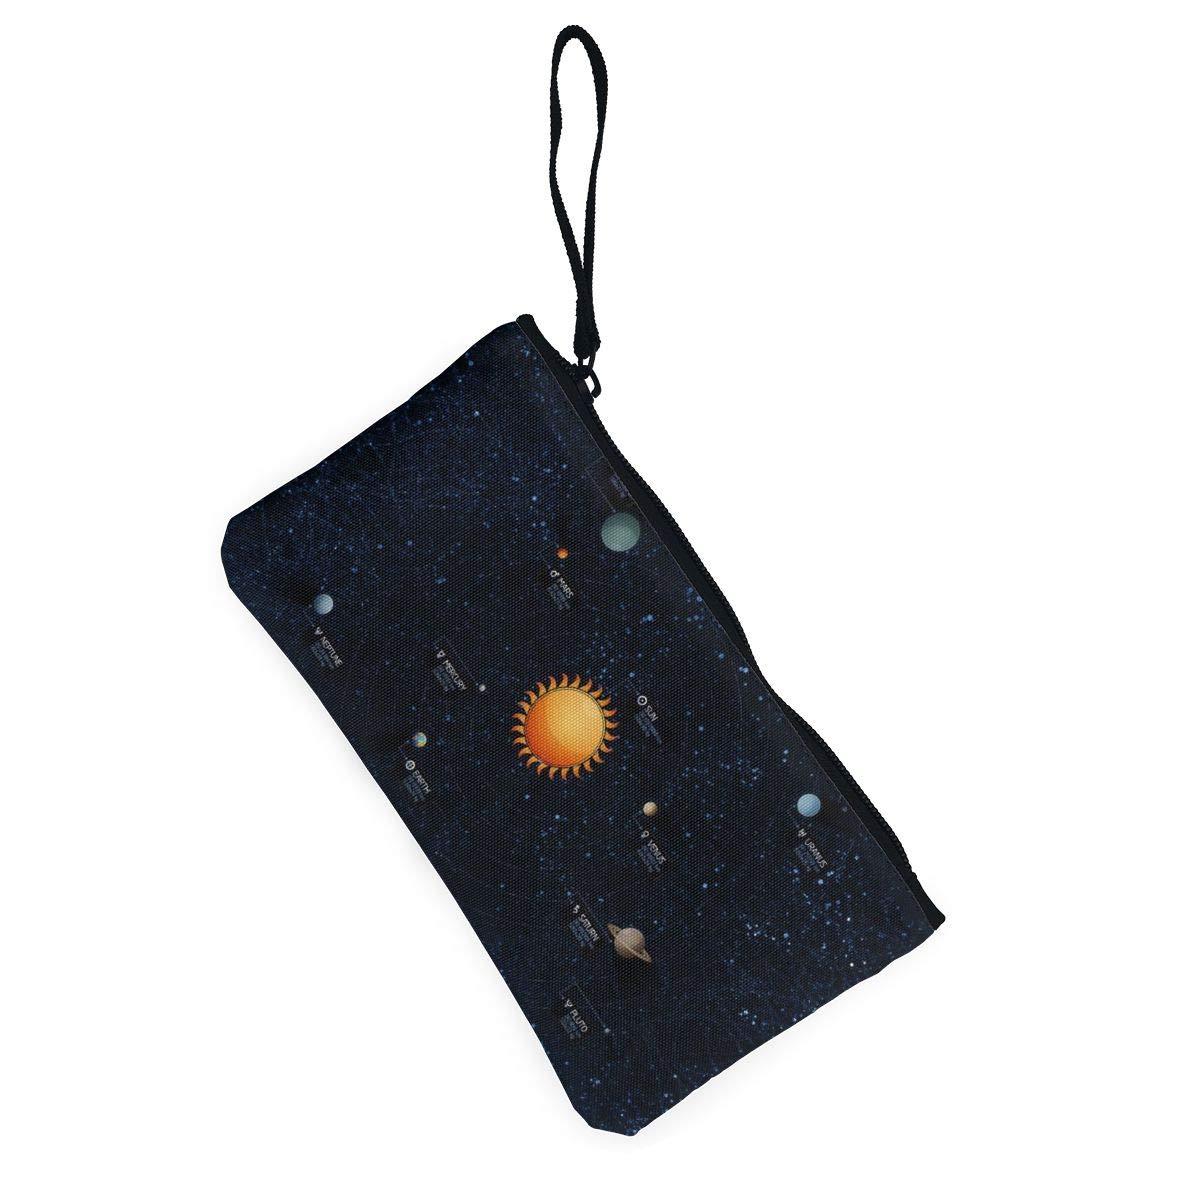 YUANSHAN Sun Solar System Unisex Canvas Coin Purse Change Cash Bag Zipper Small Purse Wallets with Handle